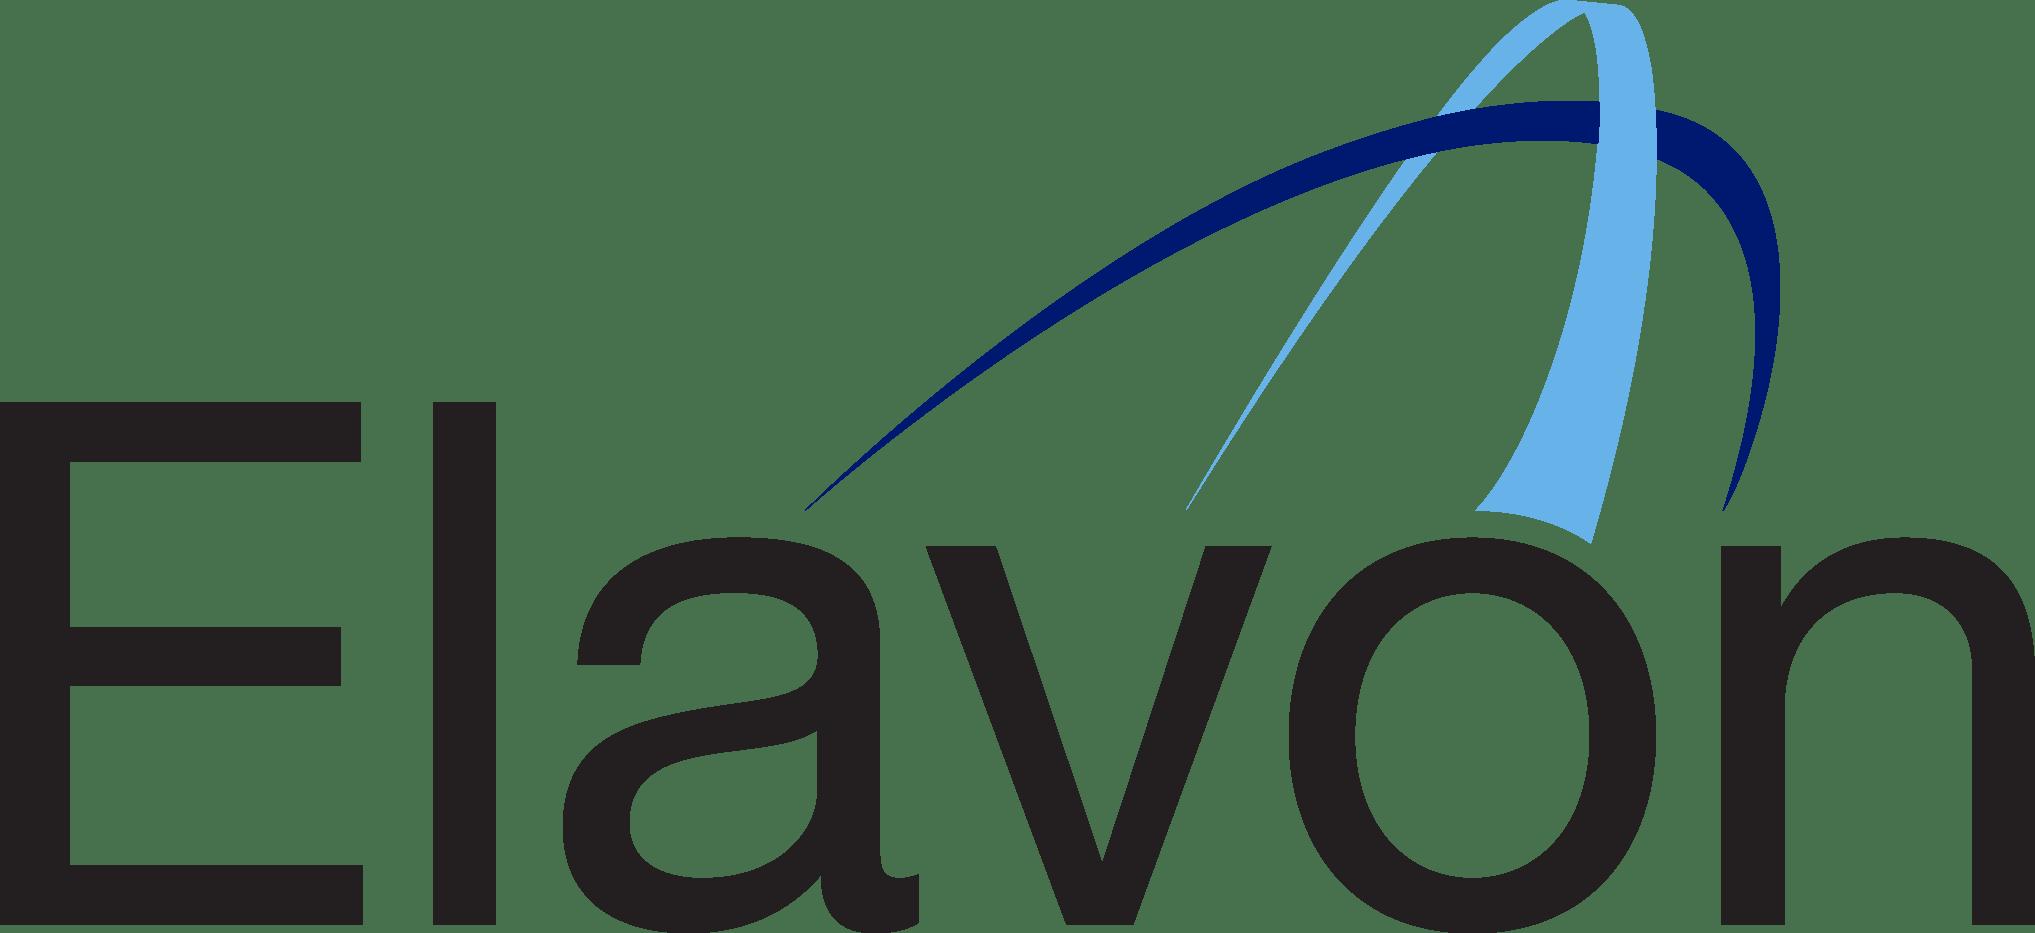 Elavon Merchant Services Review 2019 | Reviews, Ratings